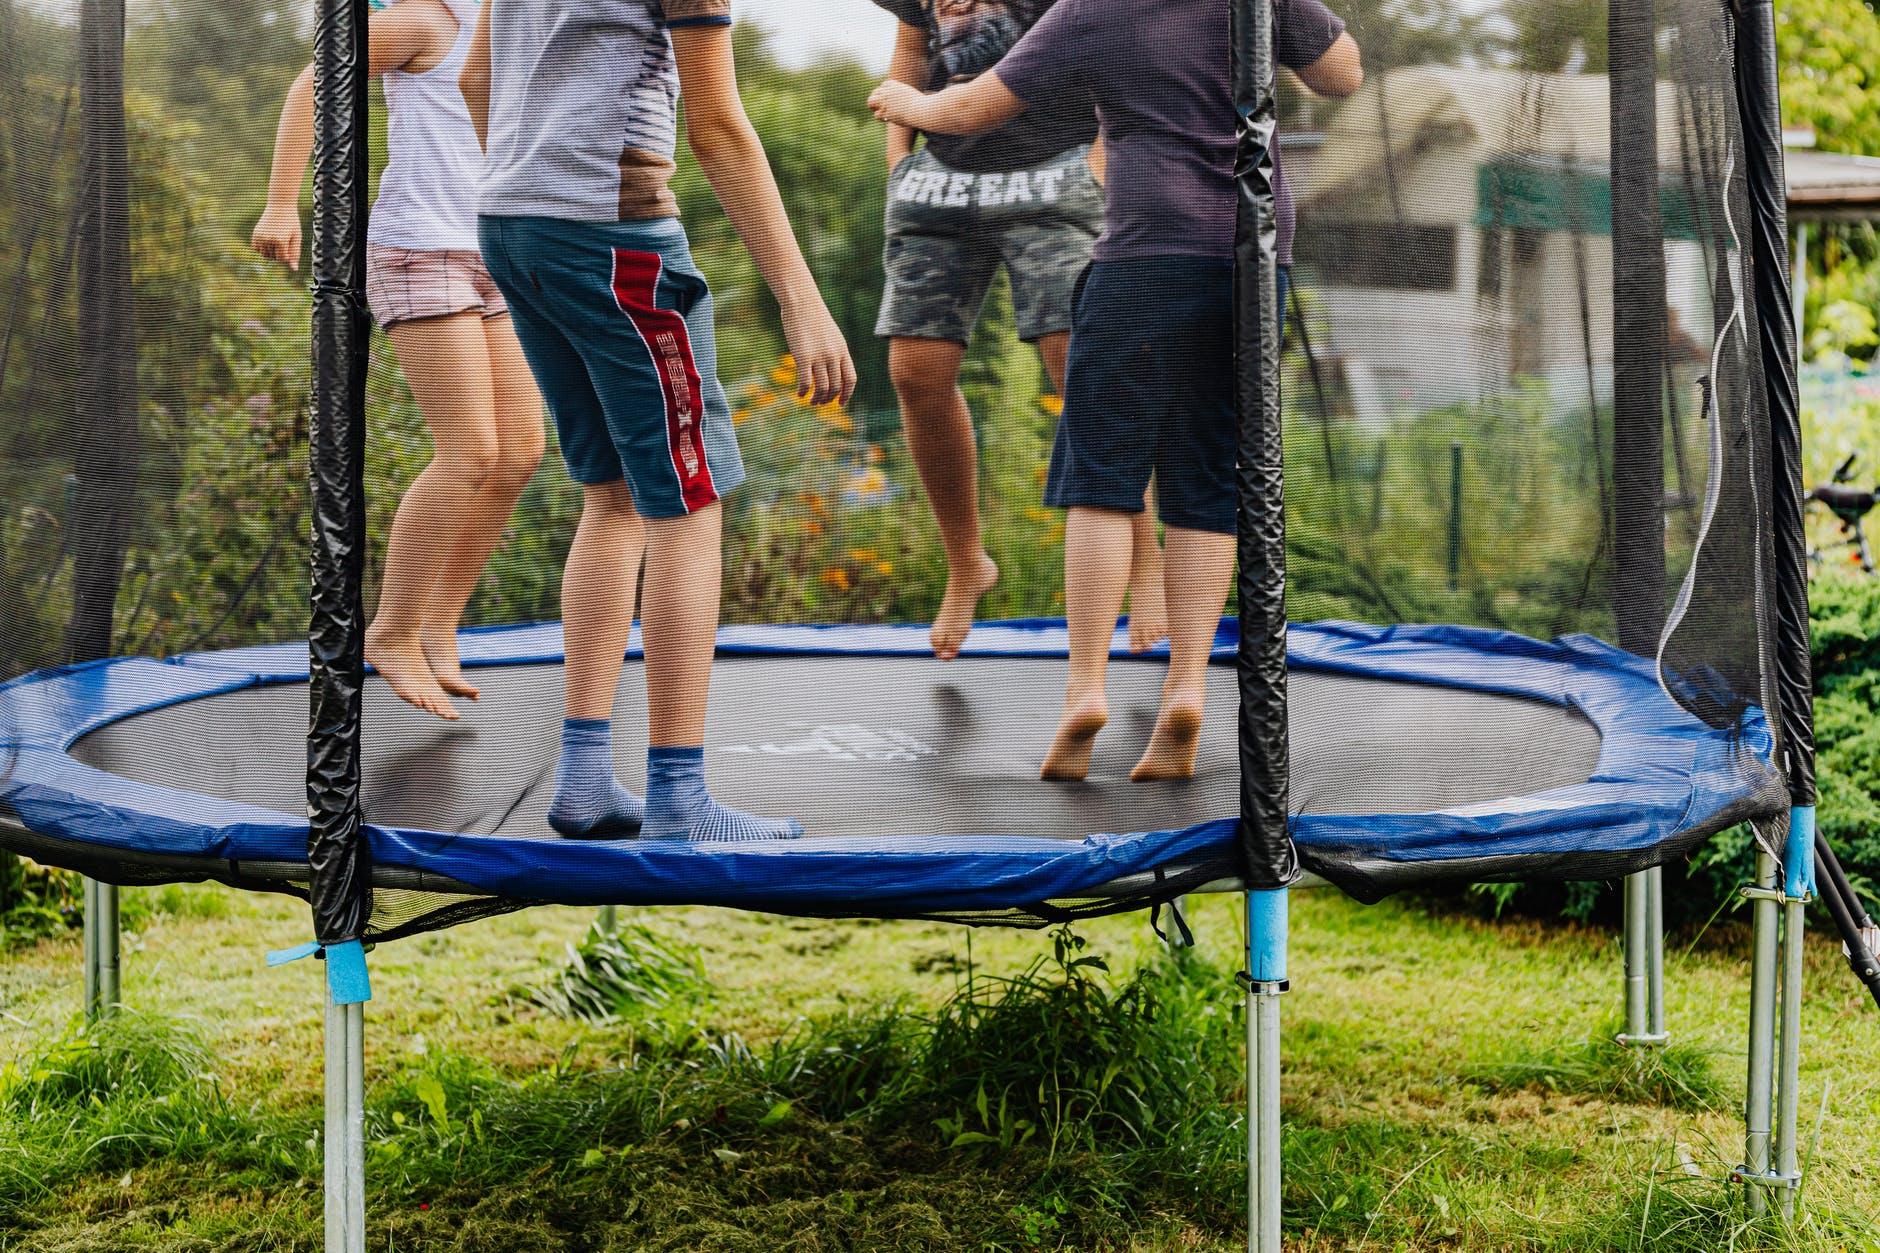 trampoline, yescomusa, backyard upgrade